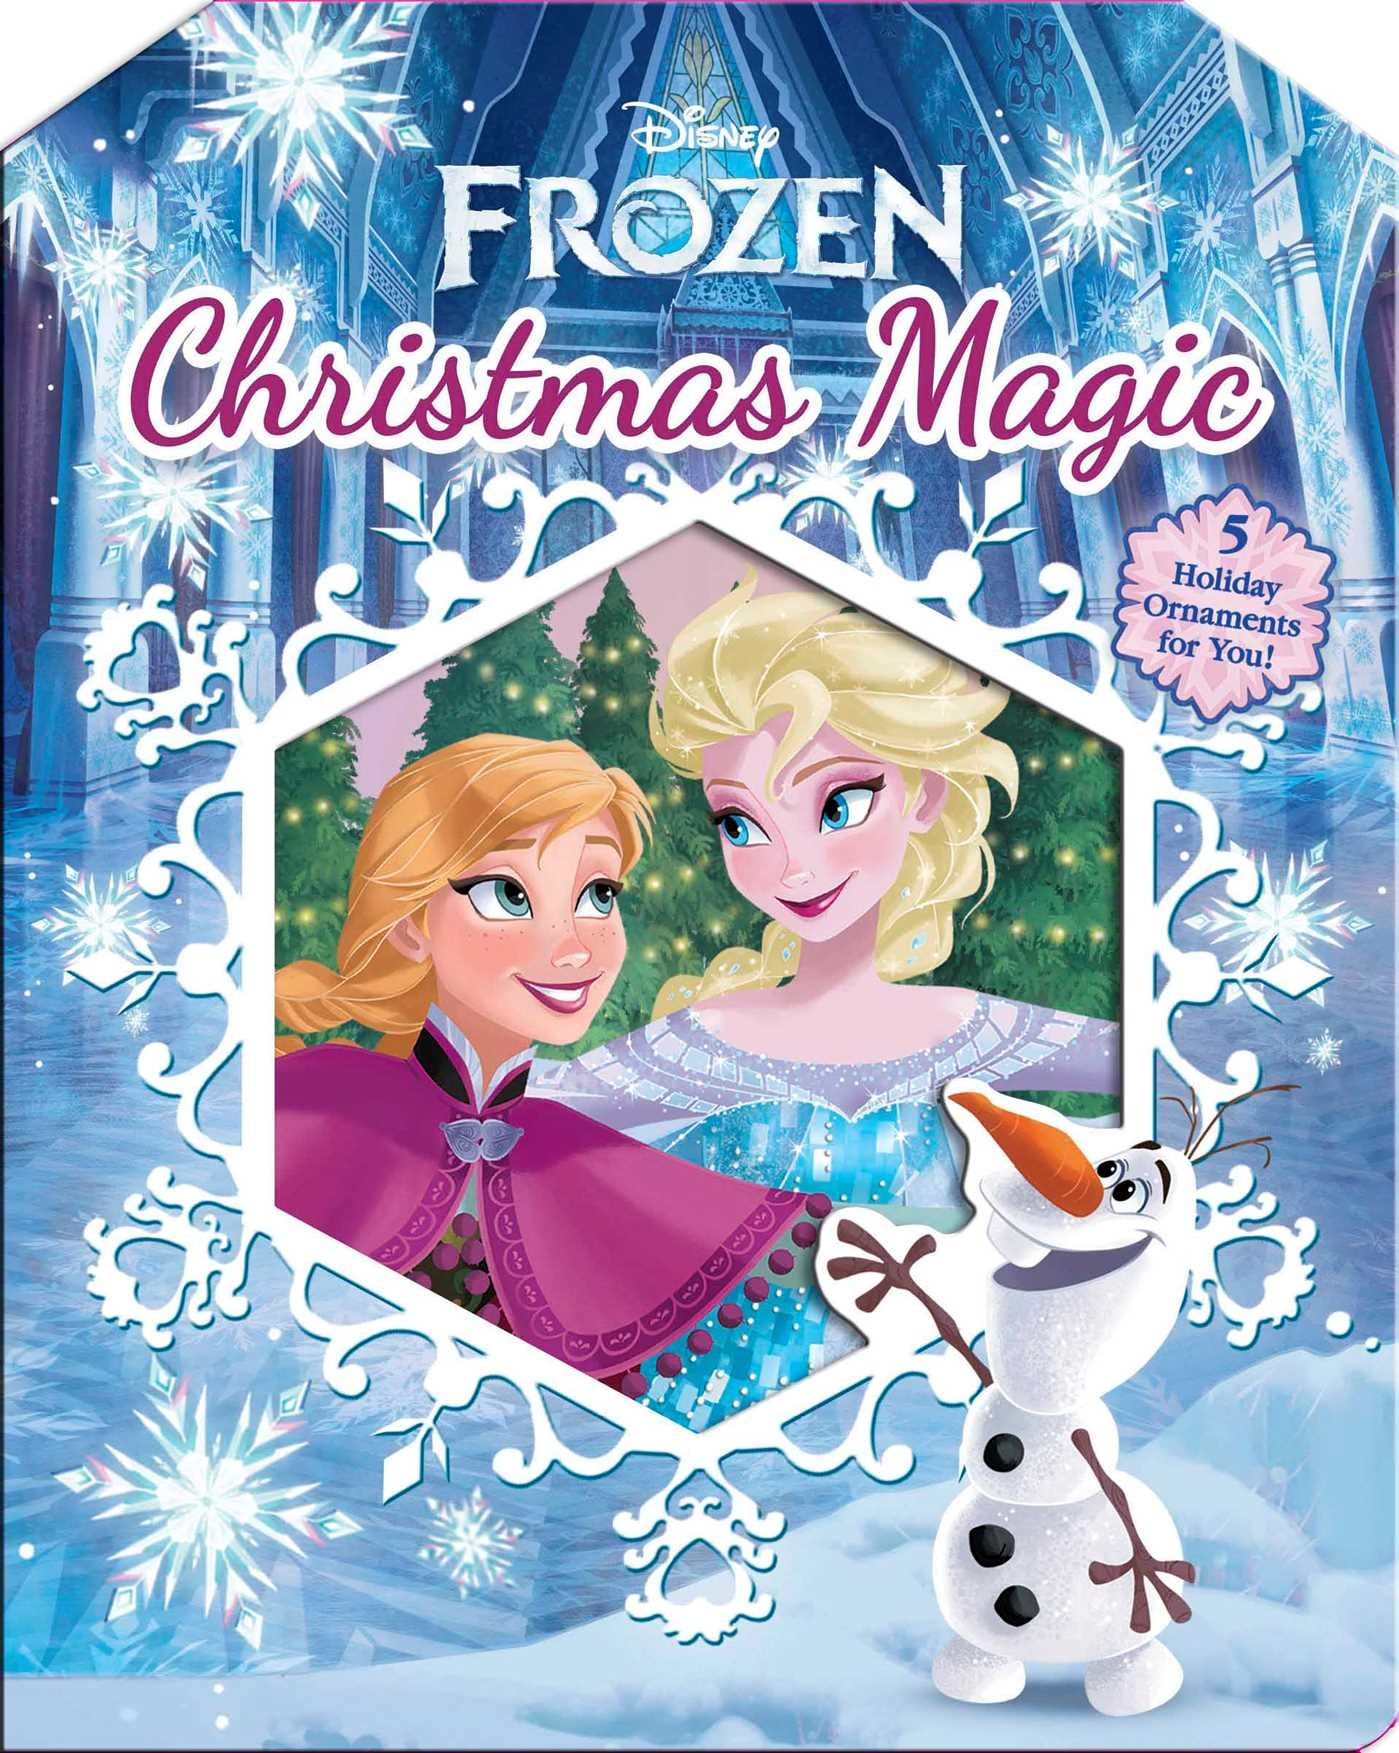 Frozen Christmas.Disney Frozen Christmas Magic Lori C Froeb 9780794435011